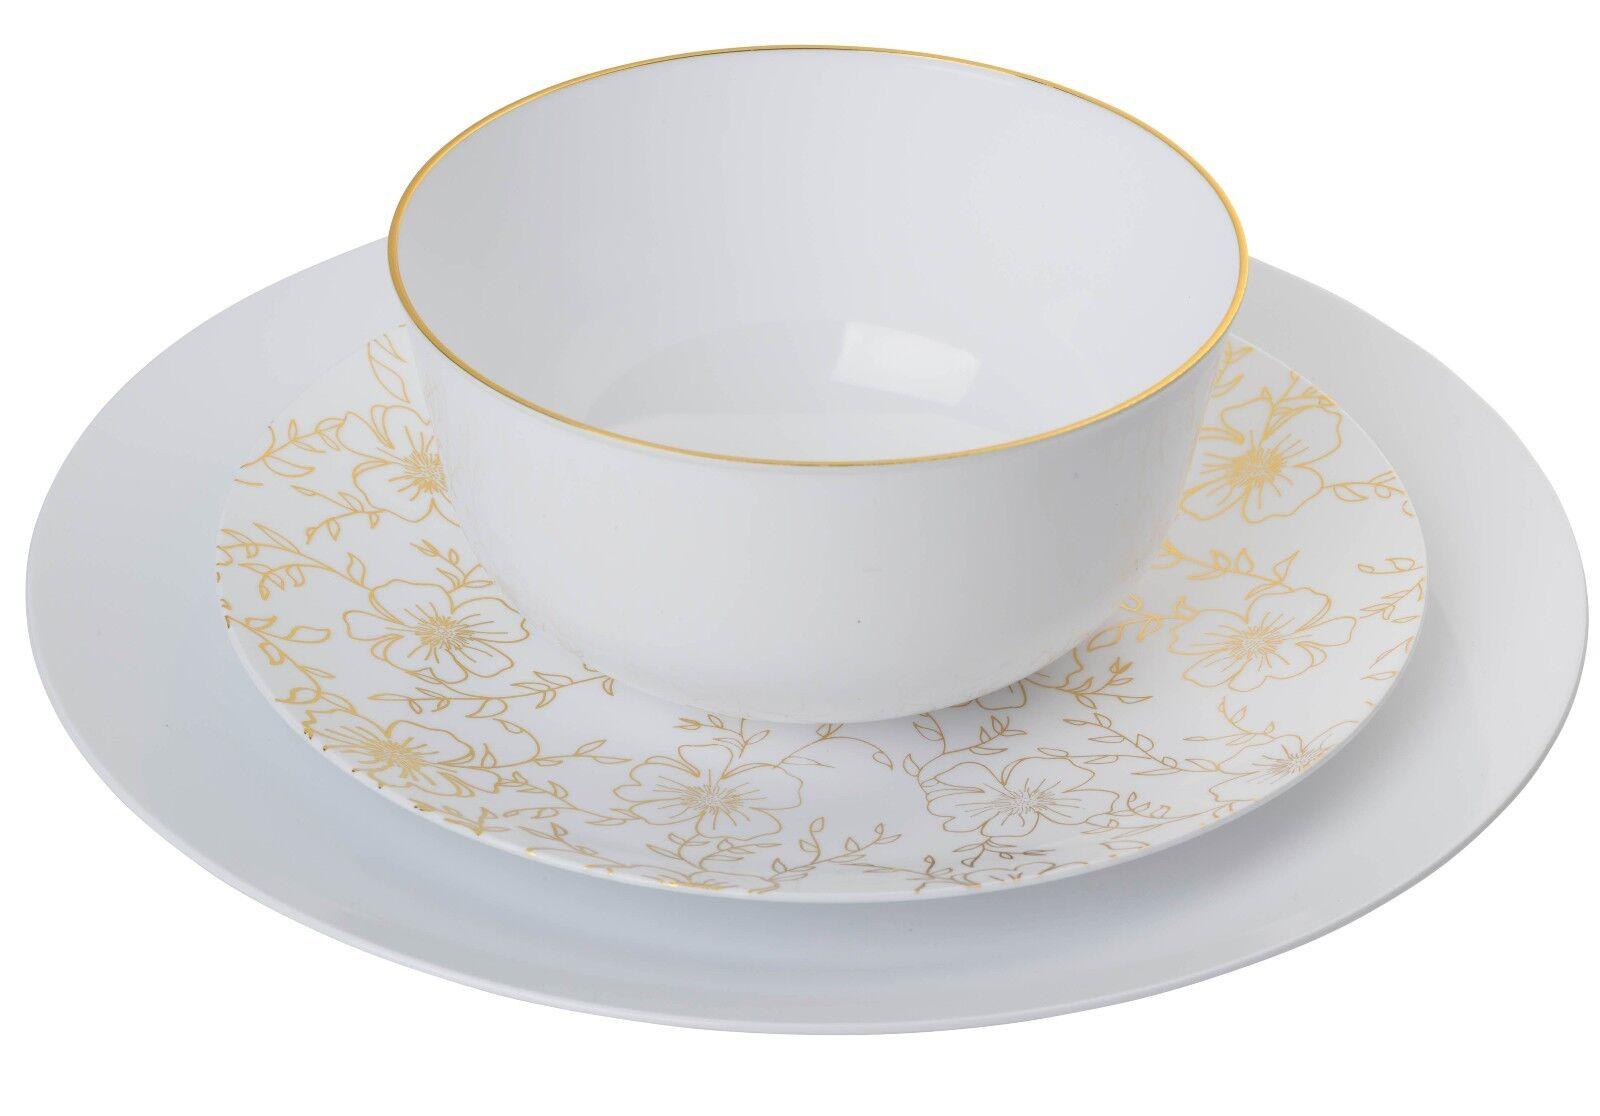 TRENDABLES Versa Premium Wedding Party Disposable Plastic Dinnerware-FREE SHIP